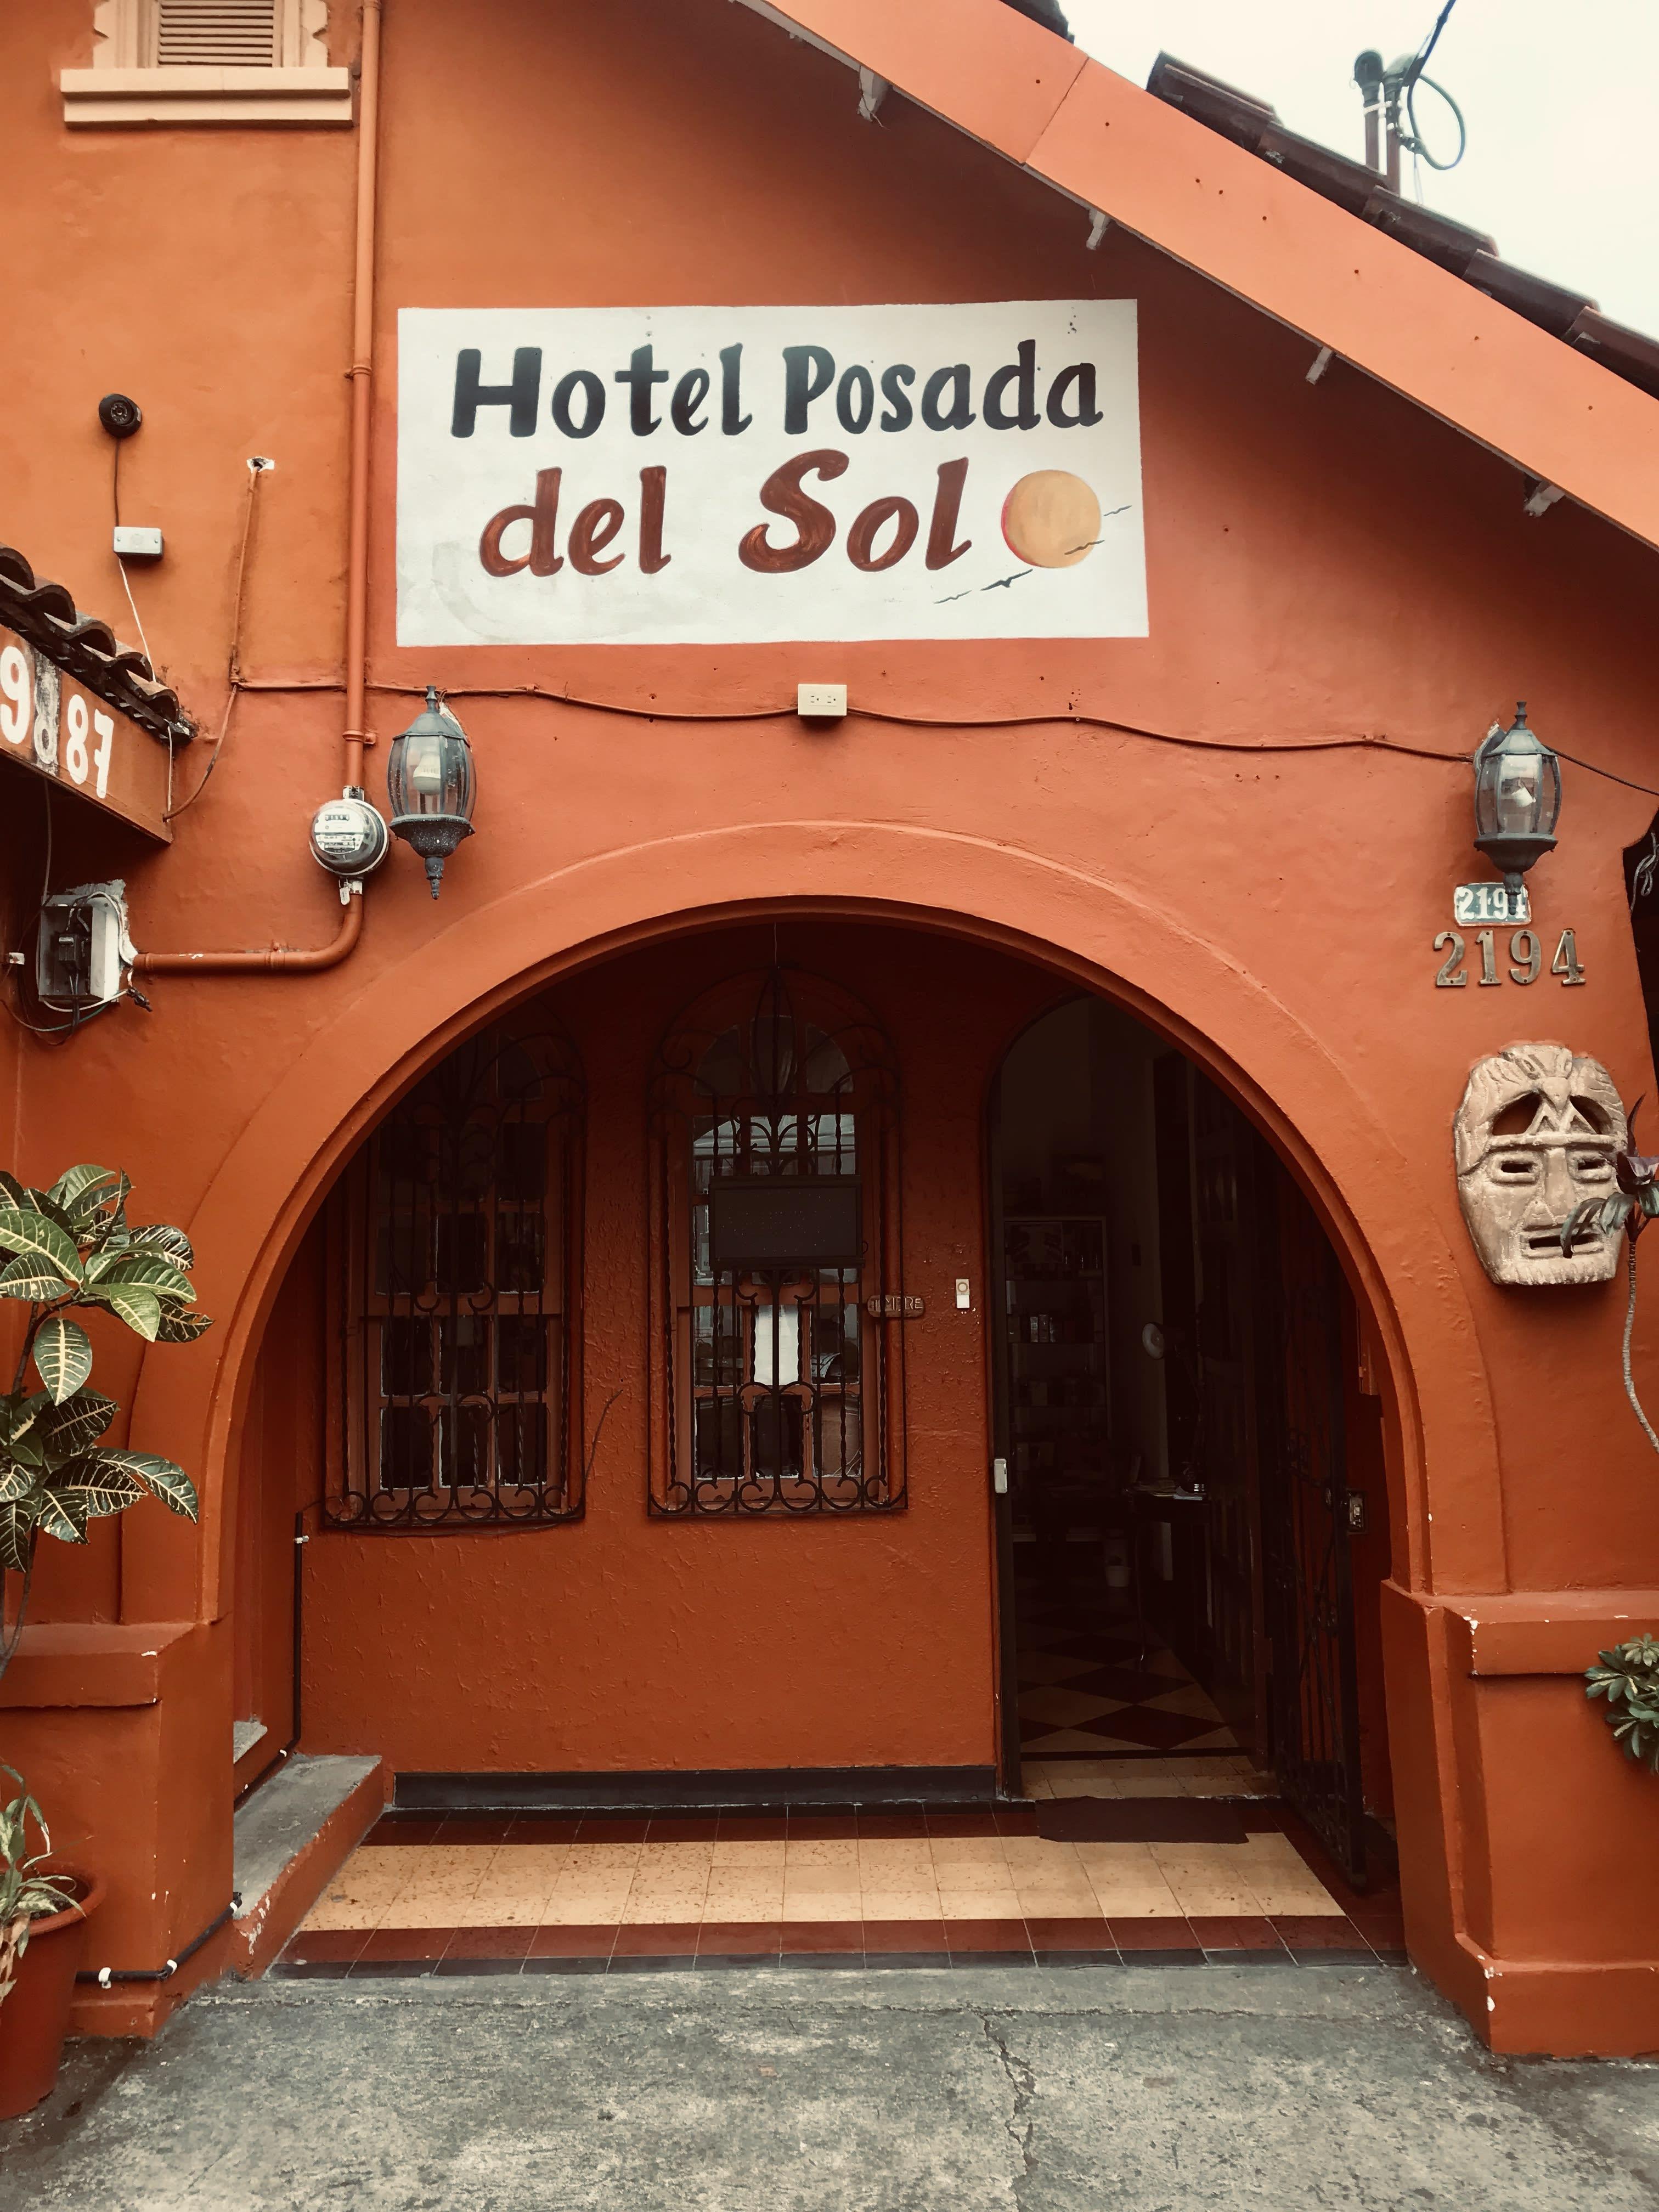 HOSTEL - Hotel Posada del Sol